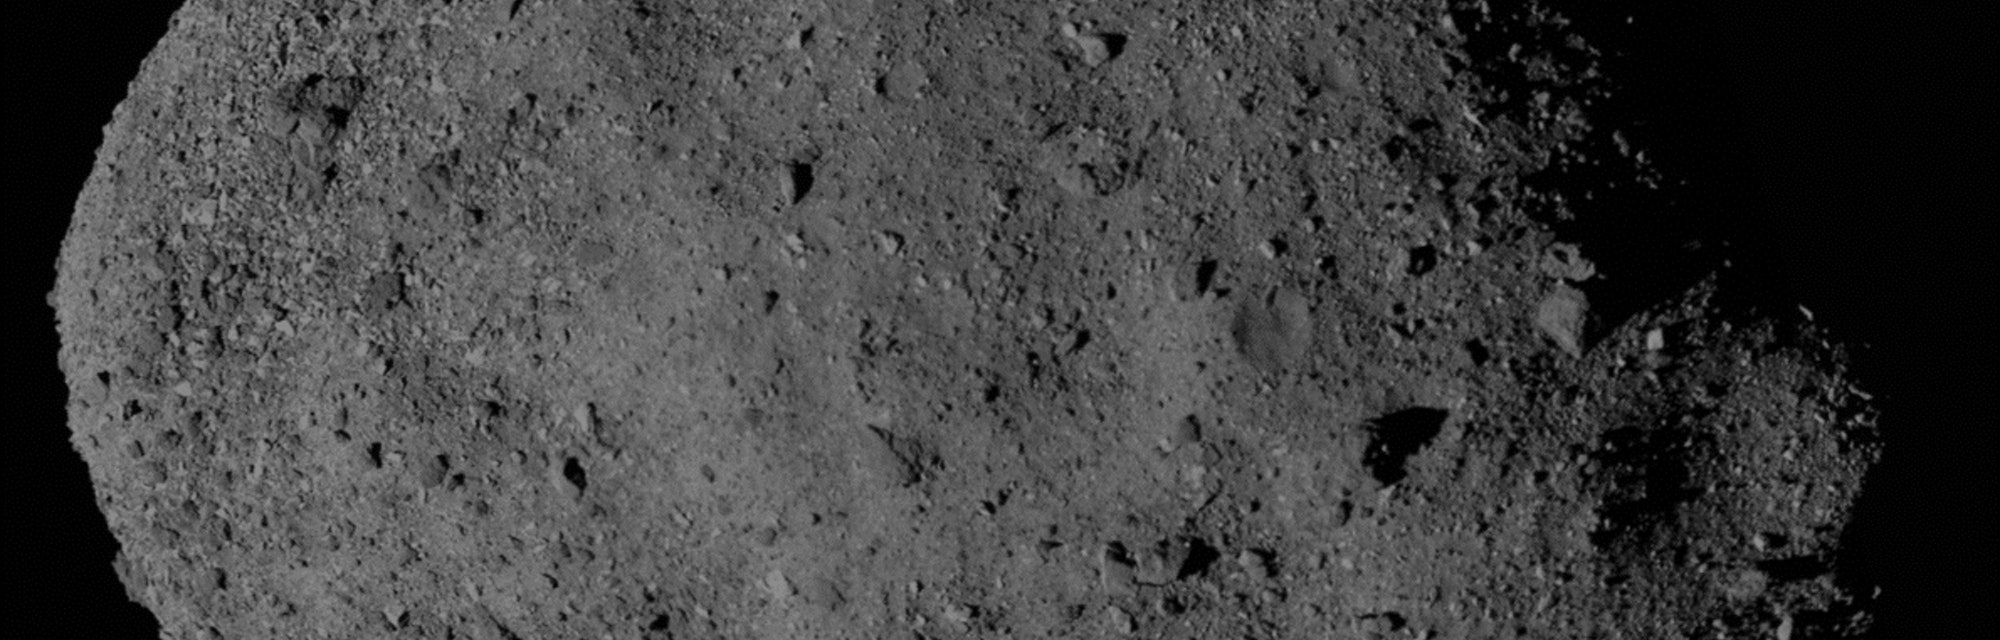 The near Earth asteroid Bennu.